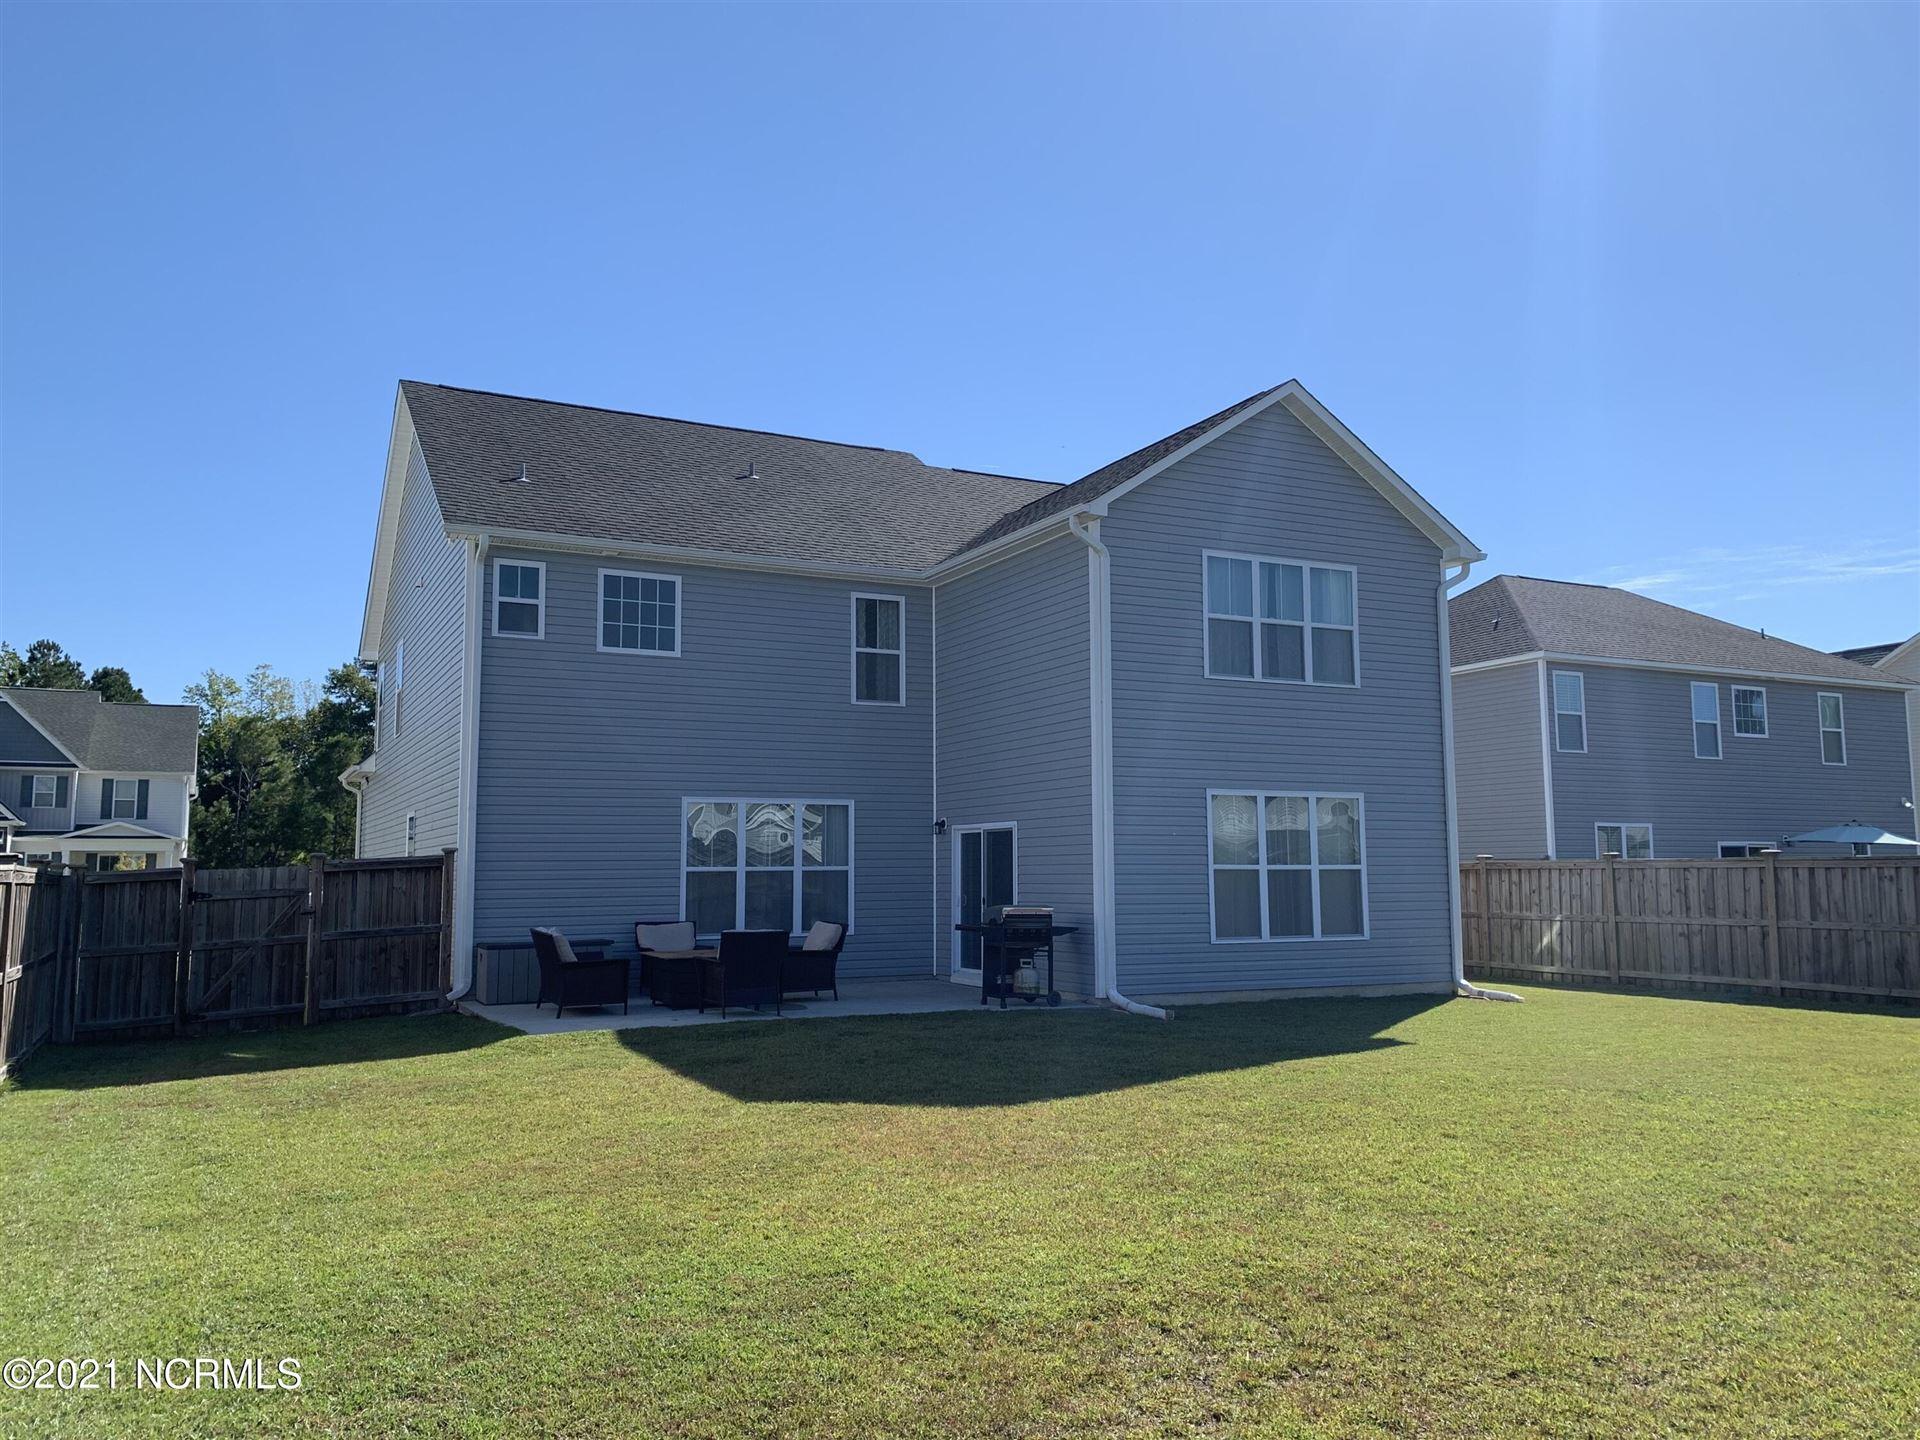 Photo of 699 Heartwood Drive, Leland, NC 28479 (MLS # 100296212)